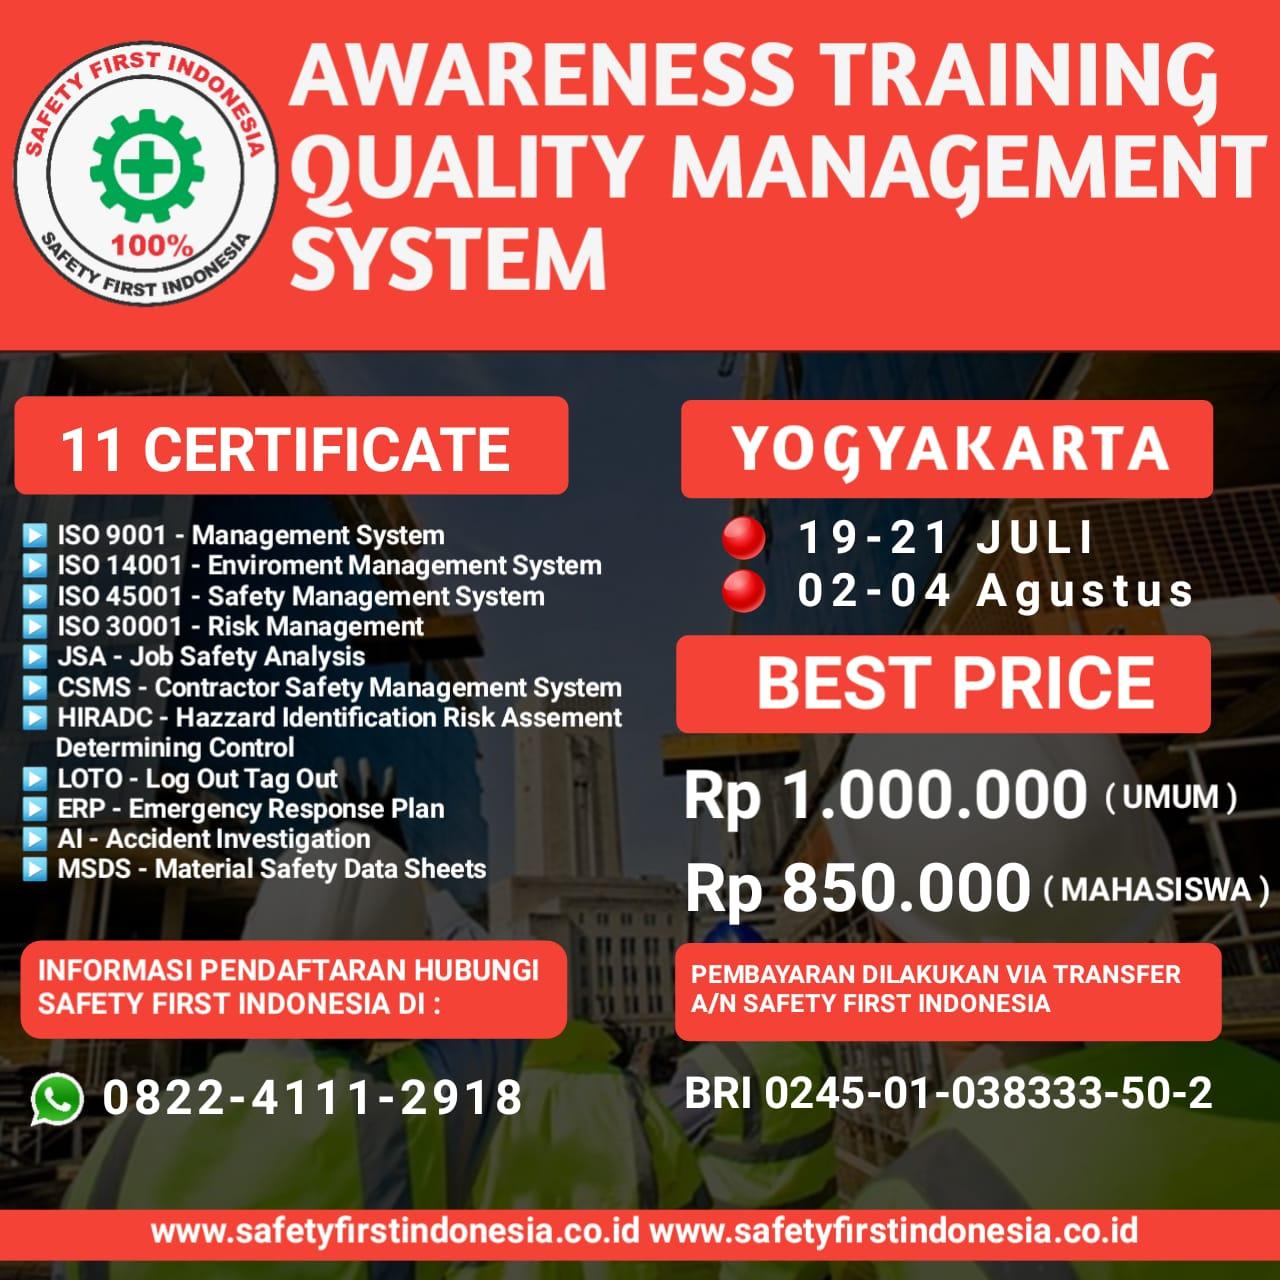 AWARENESS TRAINING QUALITY MANAGEMENT SYSTEM